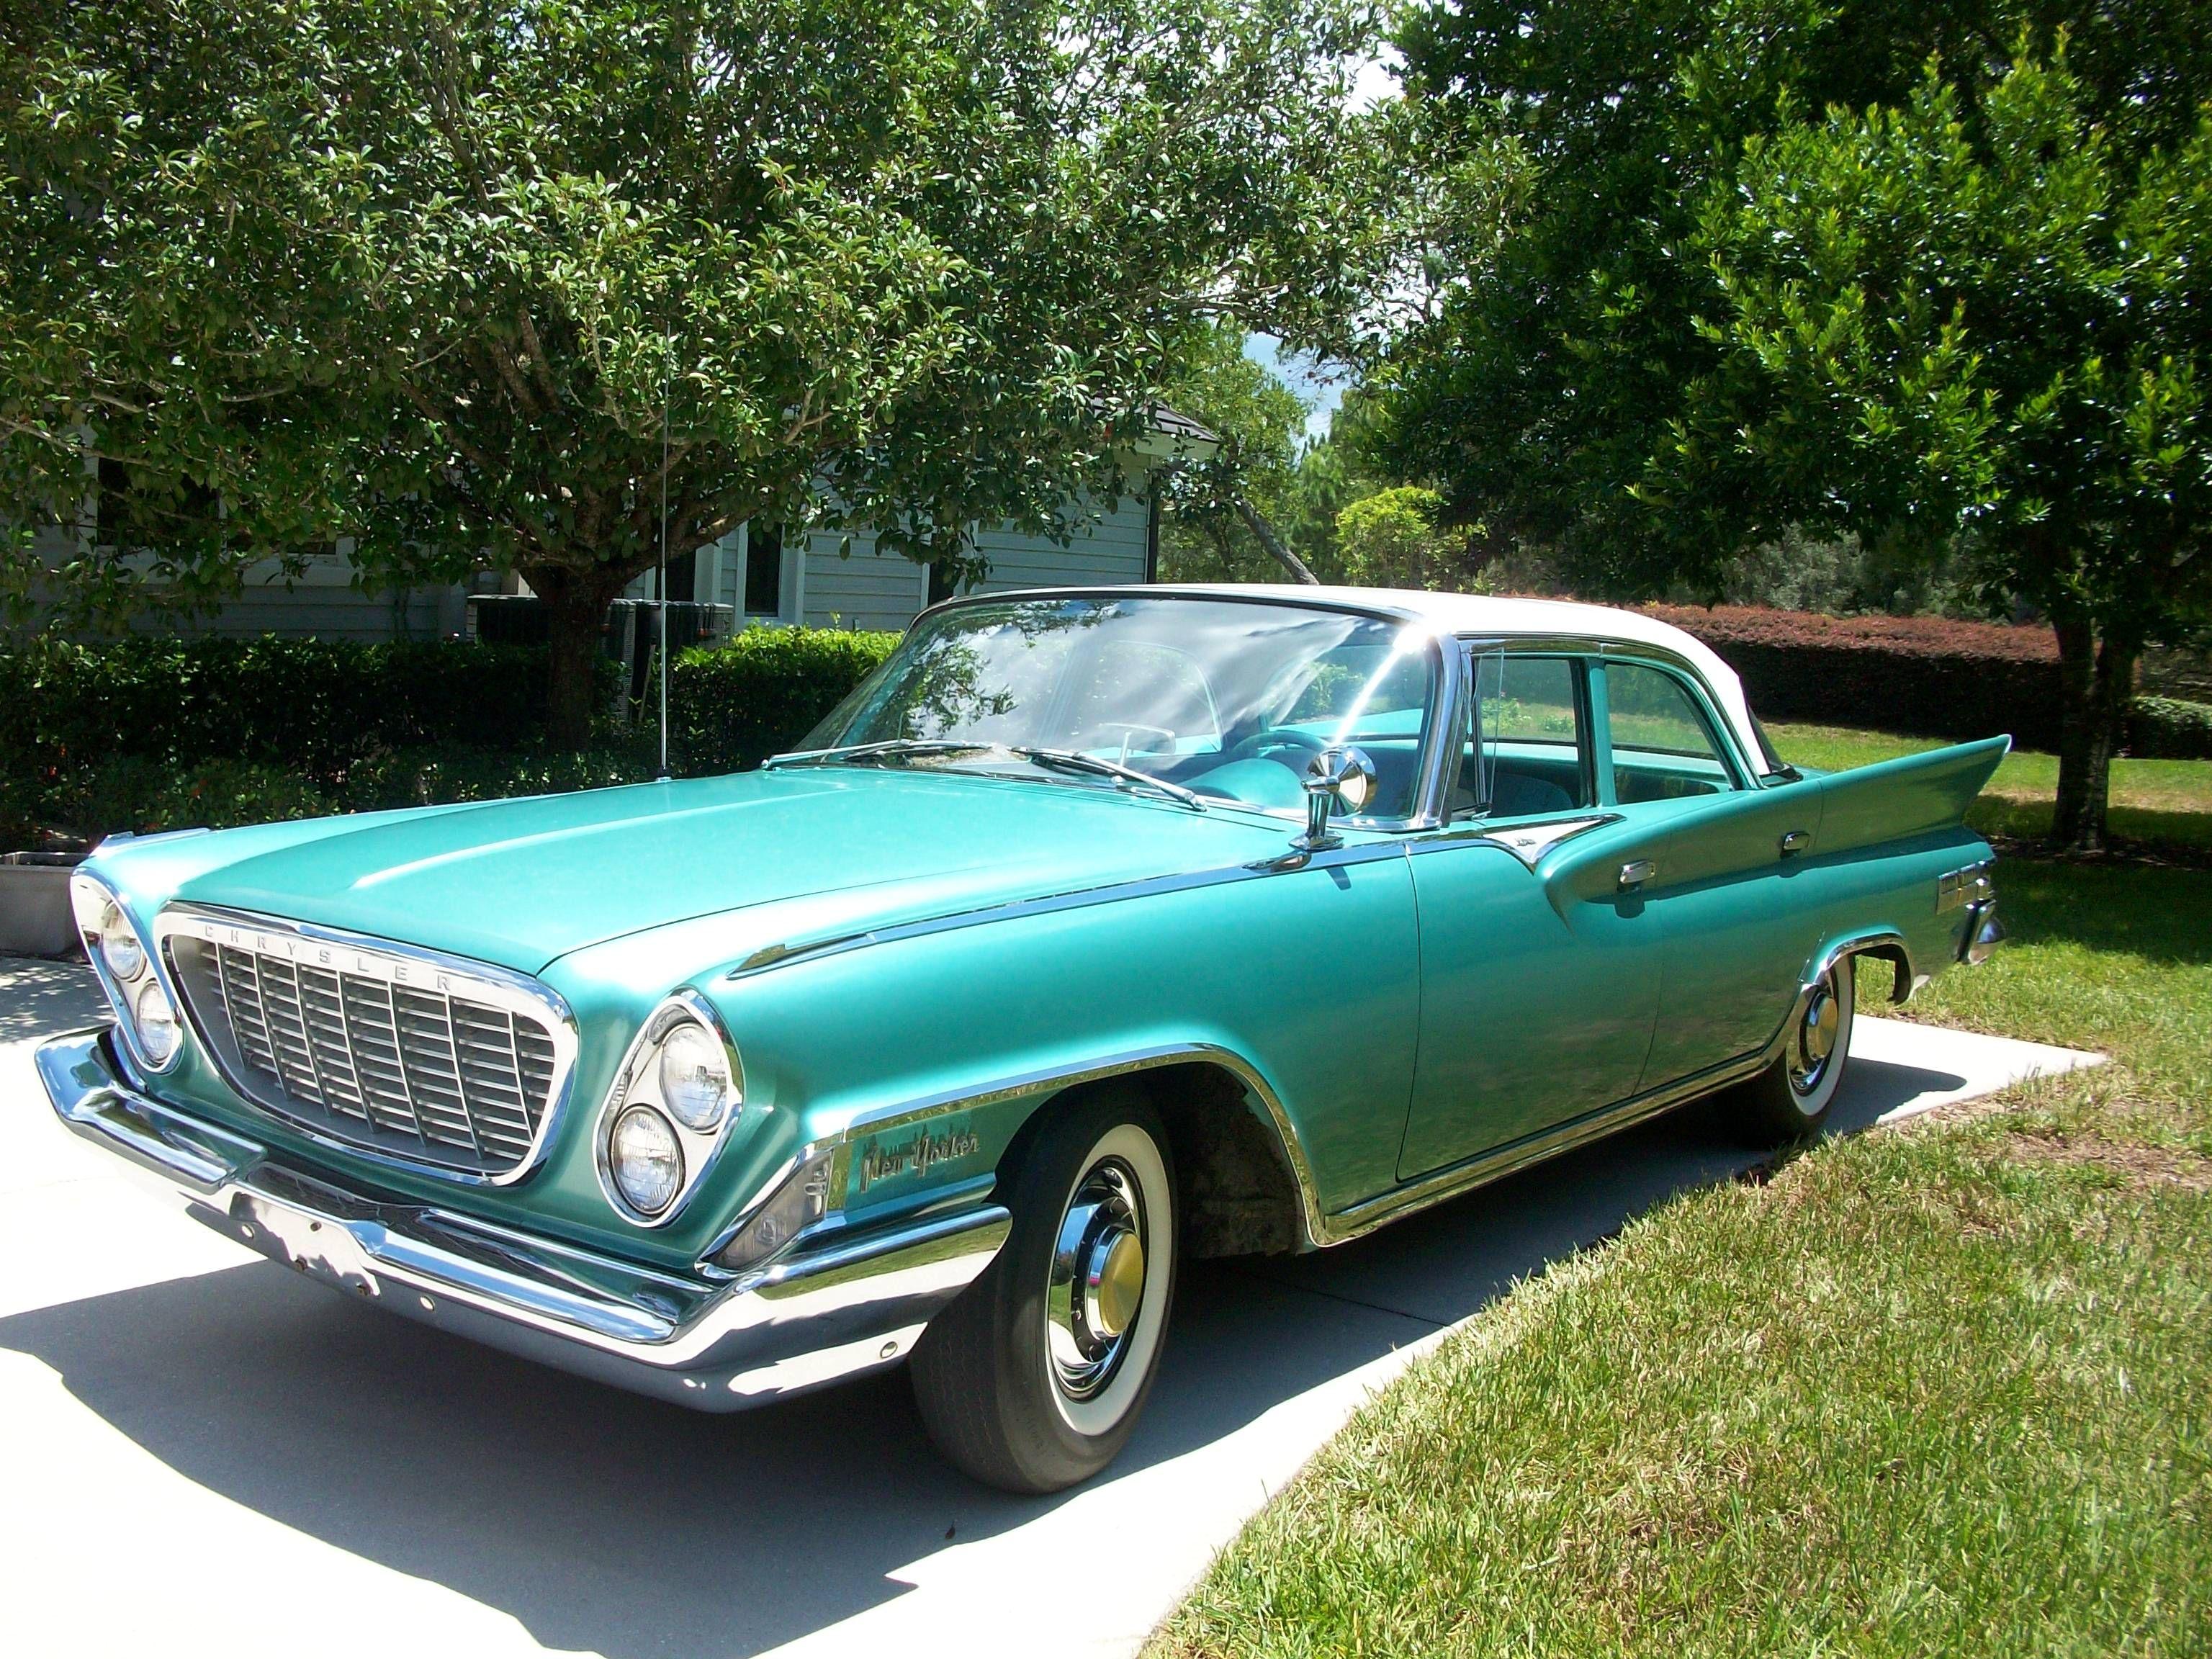 1961 Chrysler New Yorker Maintenance/restoration Of Old